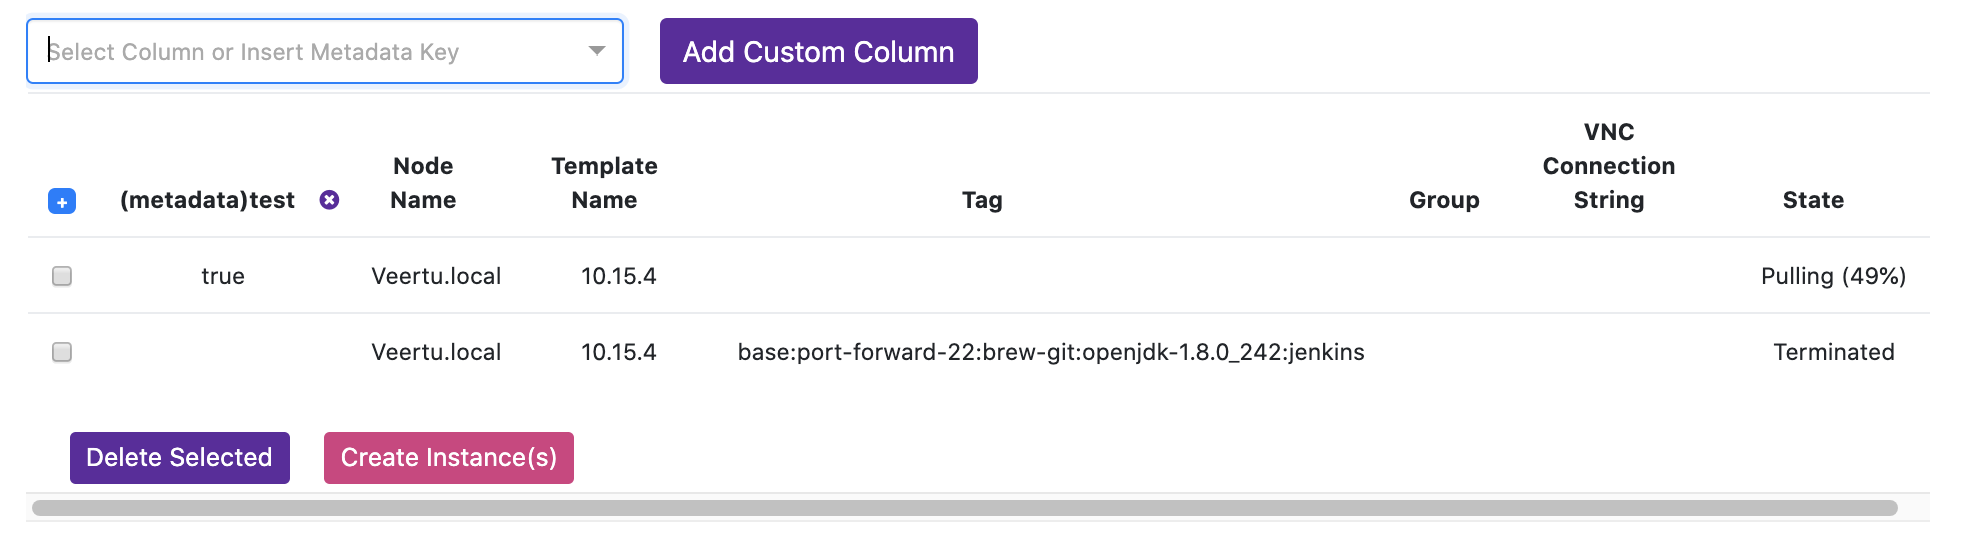 Custom Column from Metadata